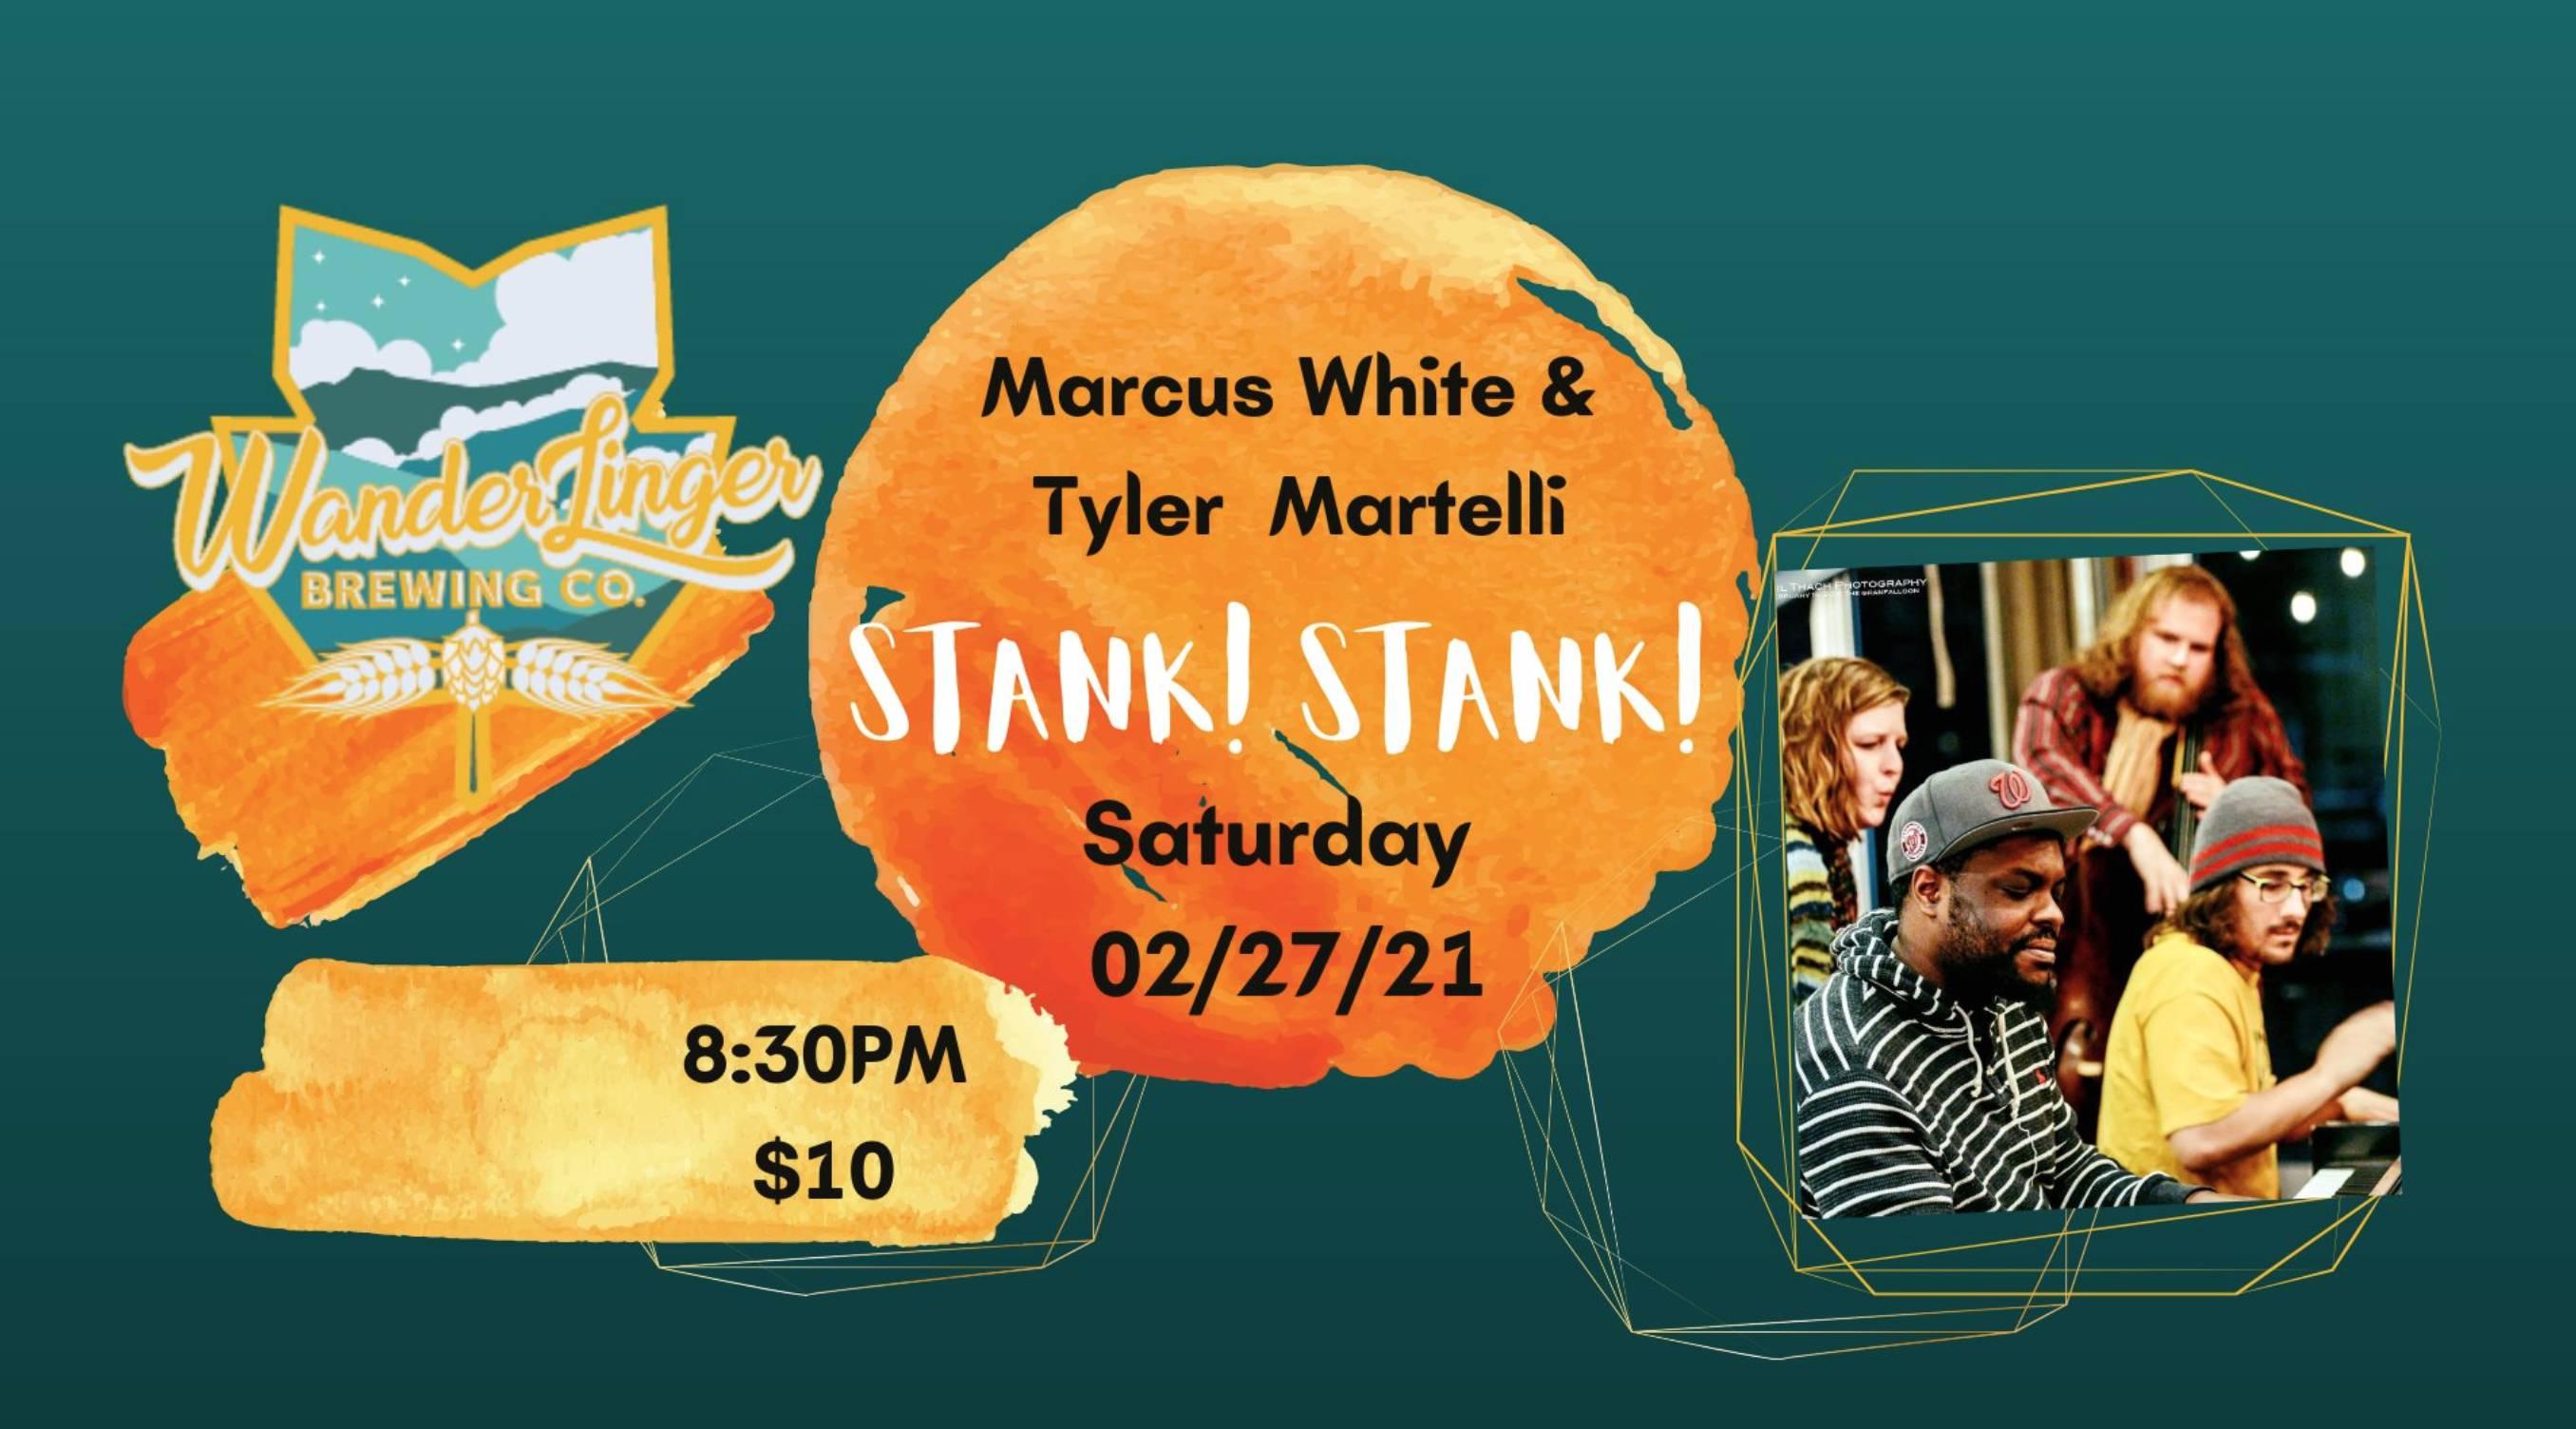 Live Music w/ Stank Stank!